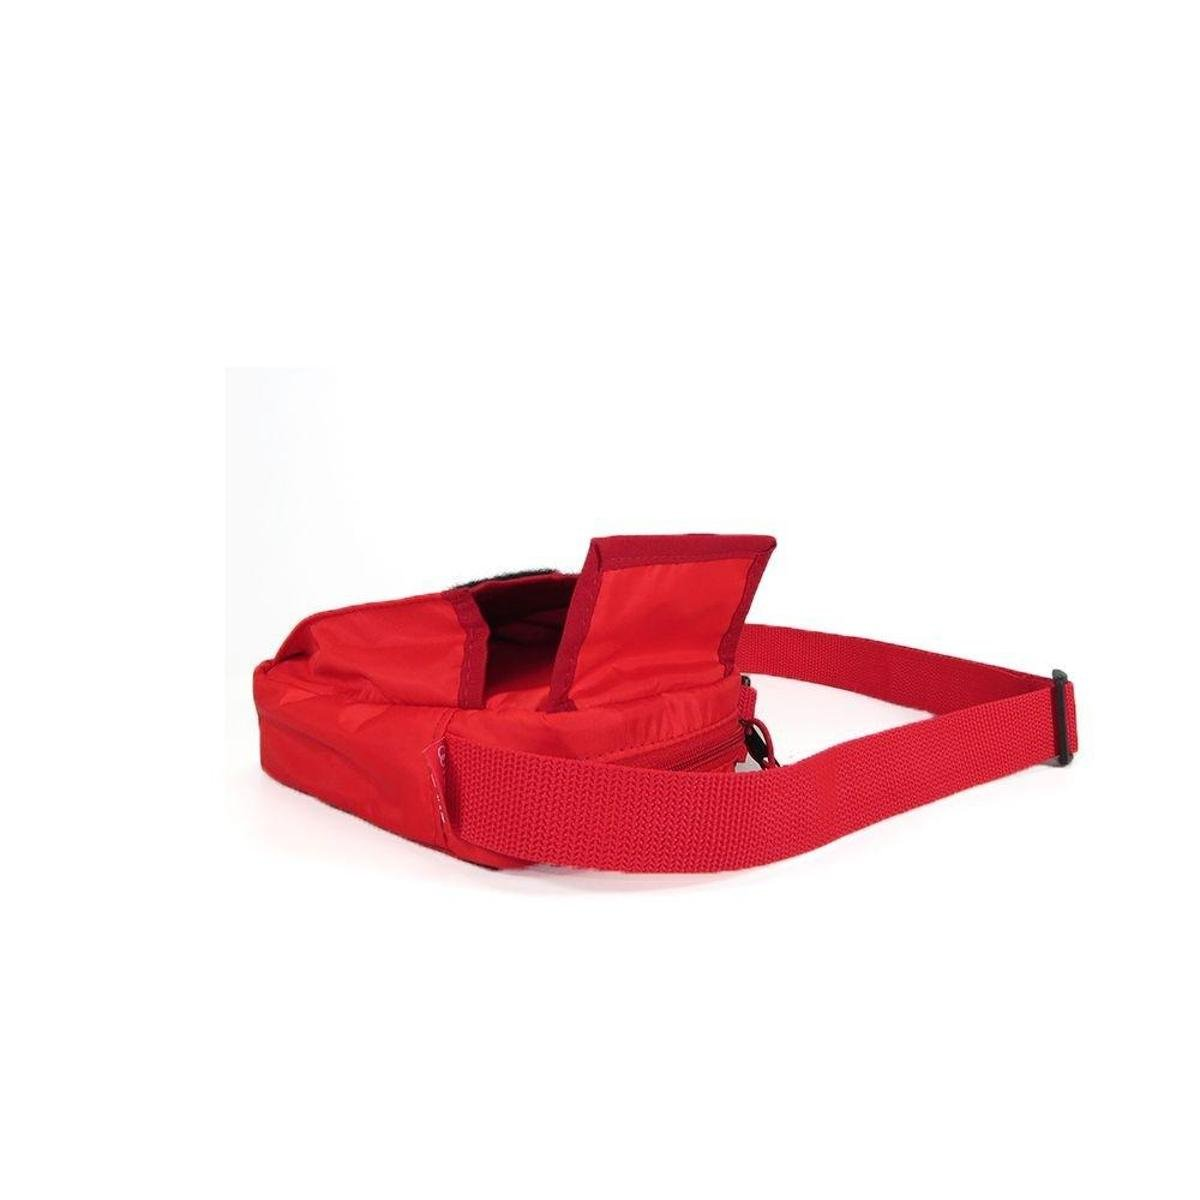 Mini Shouder Bag Impermeável Outlawz  Mini Shouder Bag Impermeável Outlawz  ... 9e2f0b9d5b4